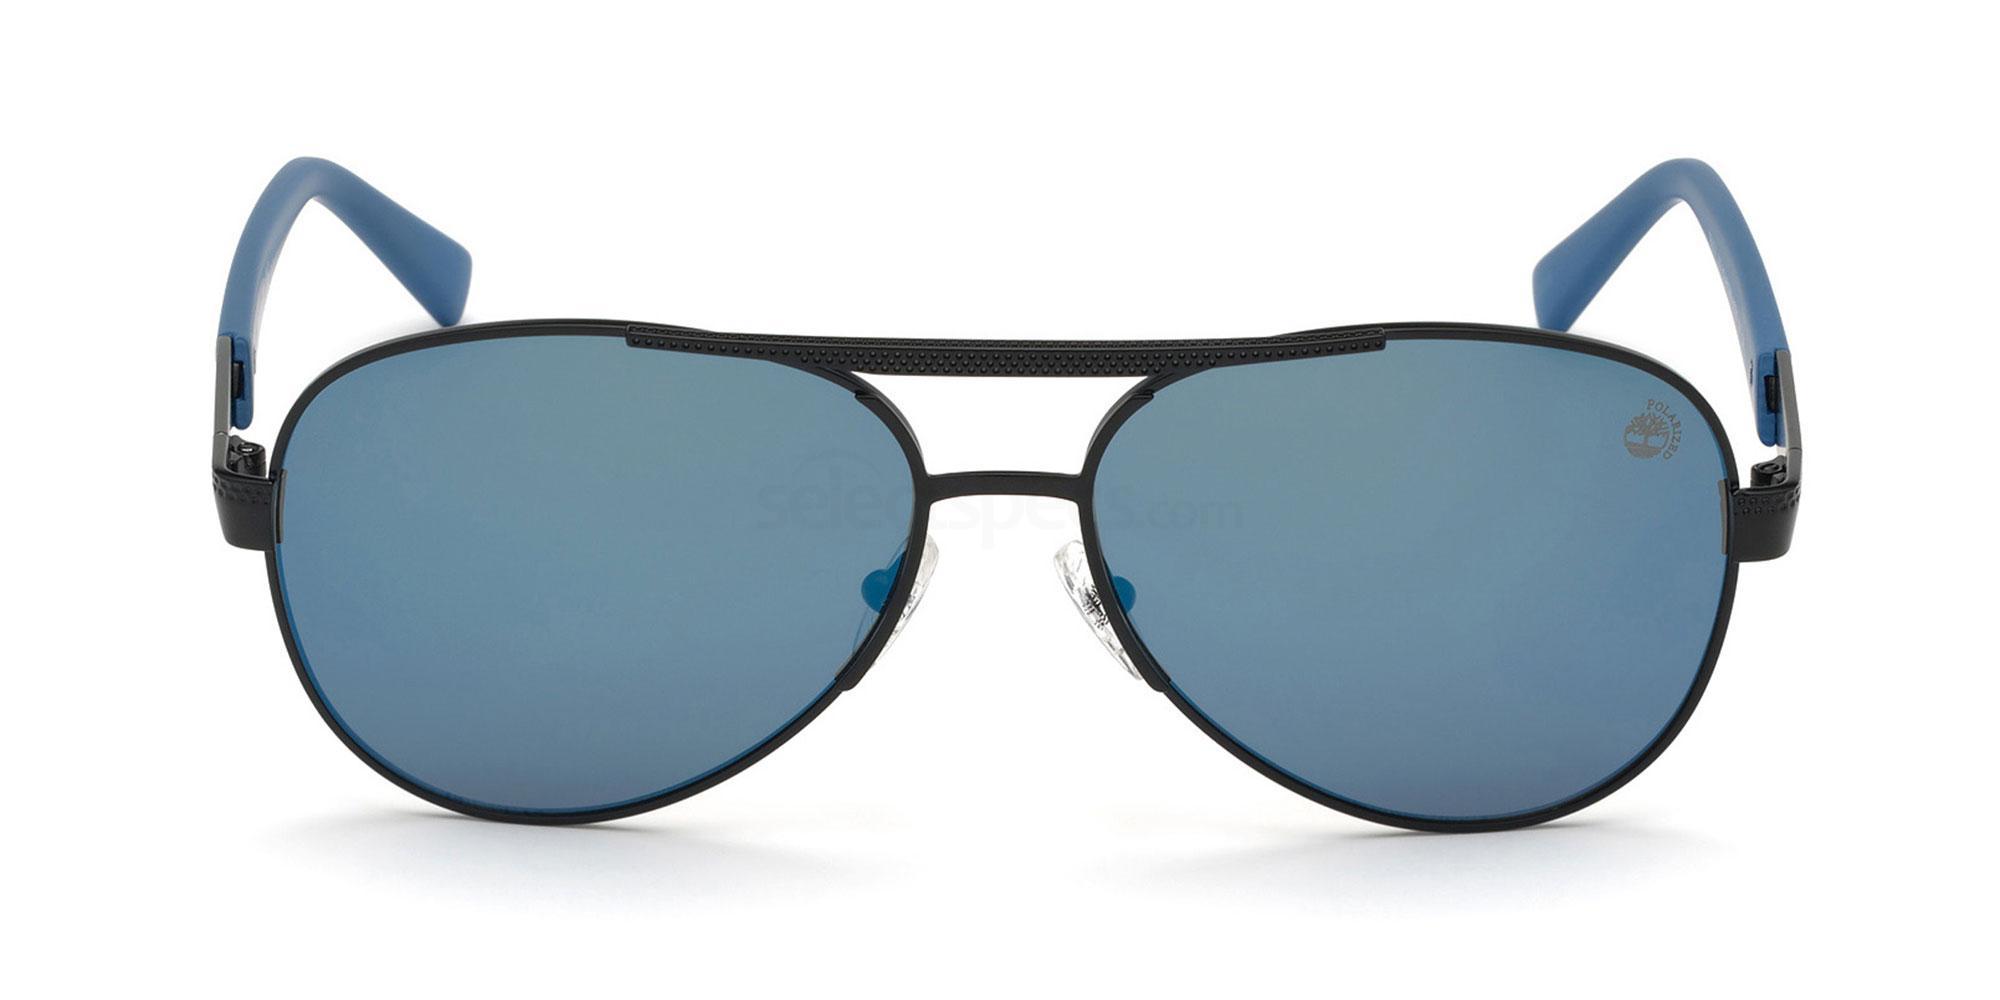 02D TB9214 Sunglasses, Timberland